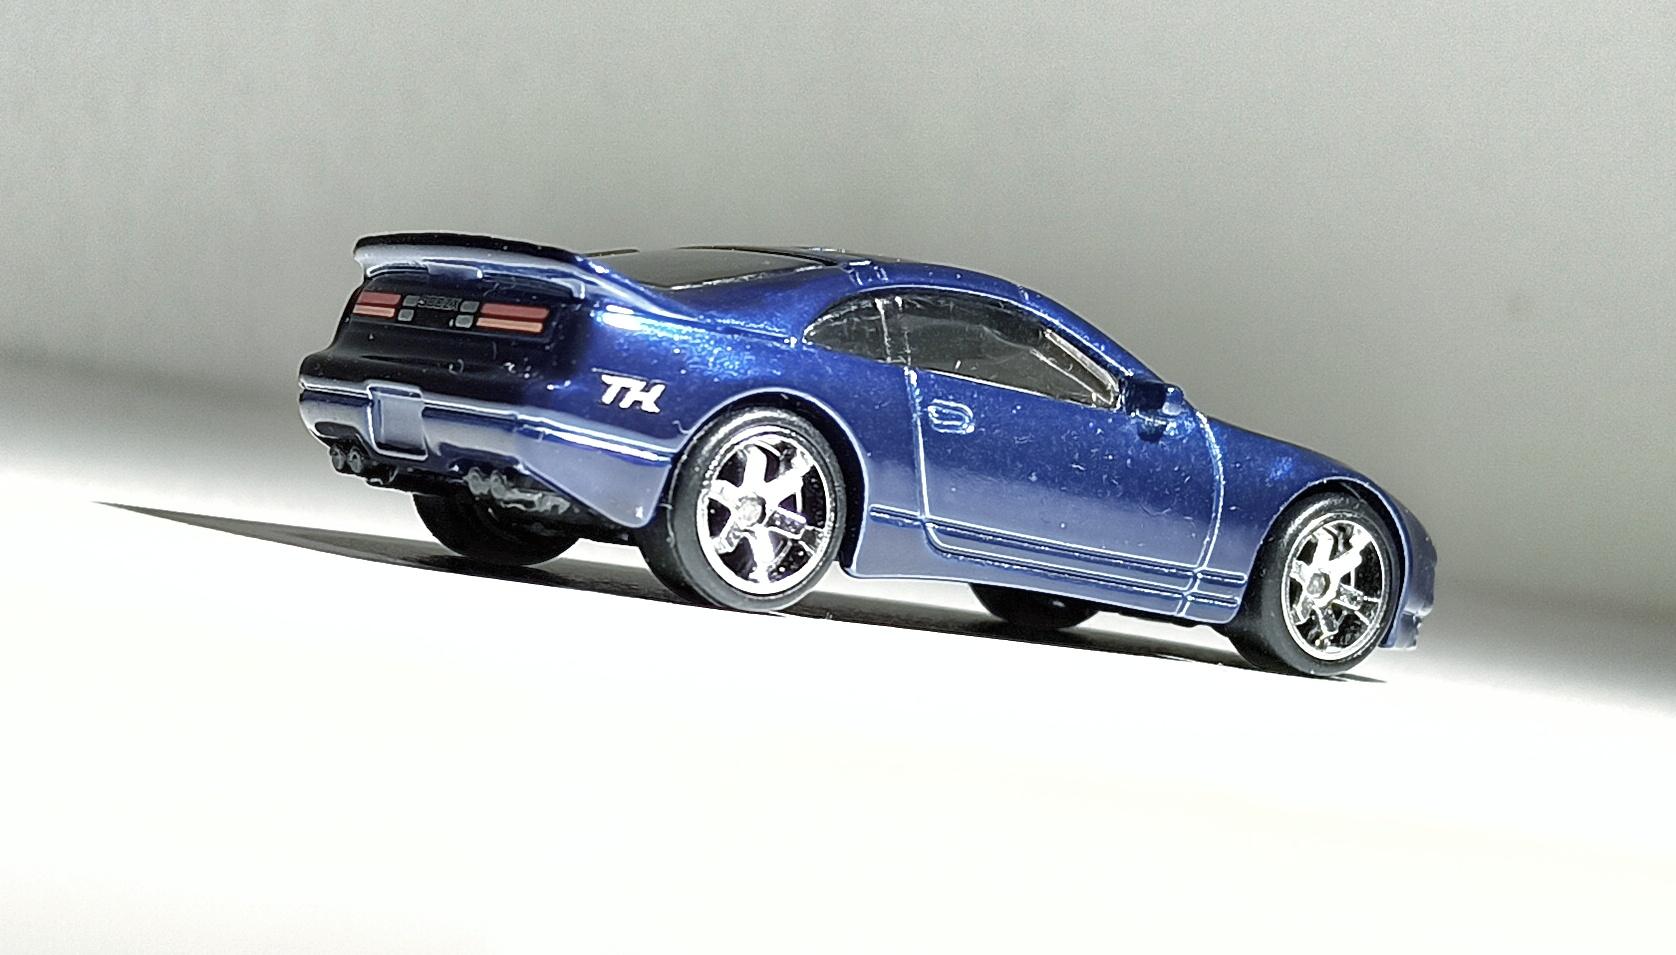 Hot Wheels Nissan 300ZX Twin Turbo (GTD10) 2021 (23/250) HW Turbo (1/5) spectraflame blue Super Treasure Hunt (STH) side angle